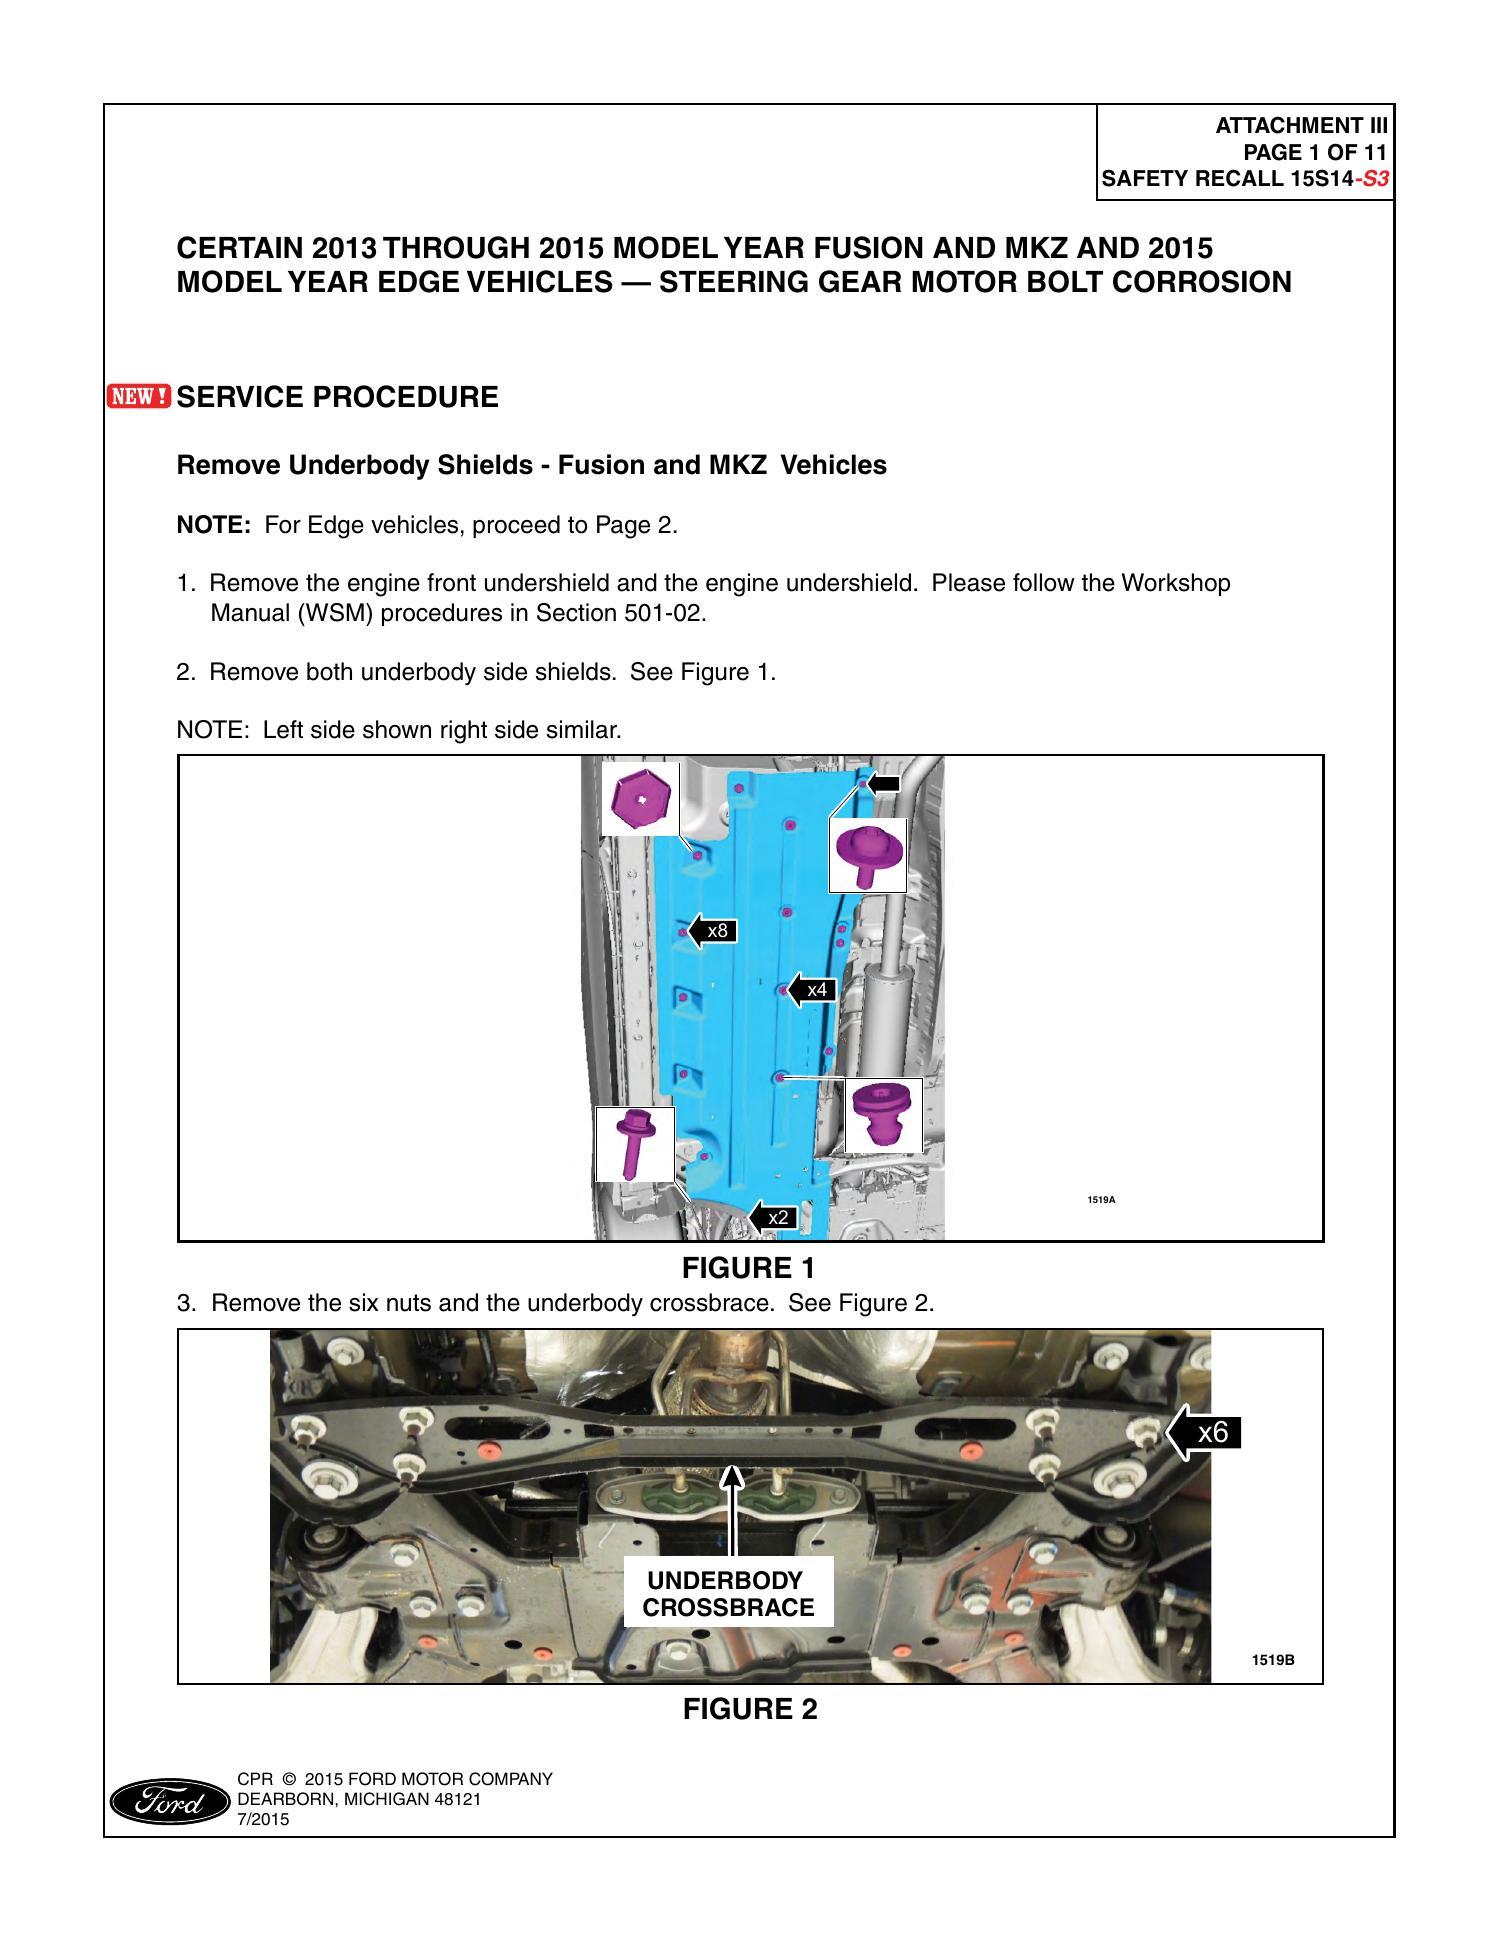 R15S143.pdf | DocDroid